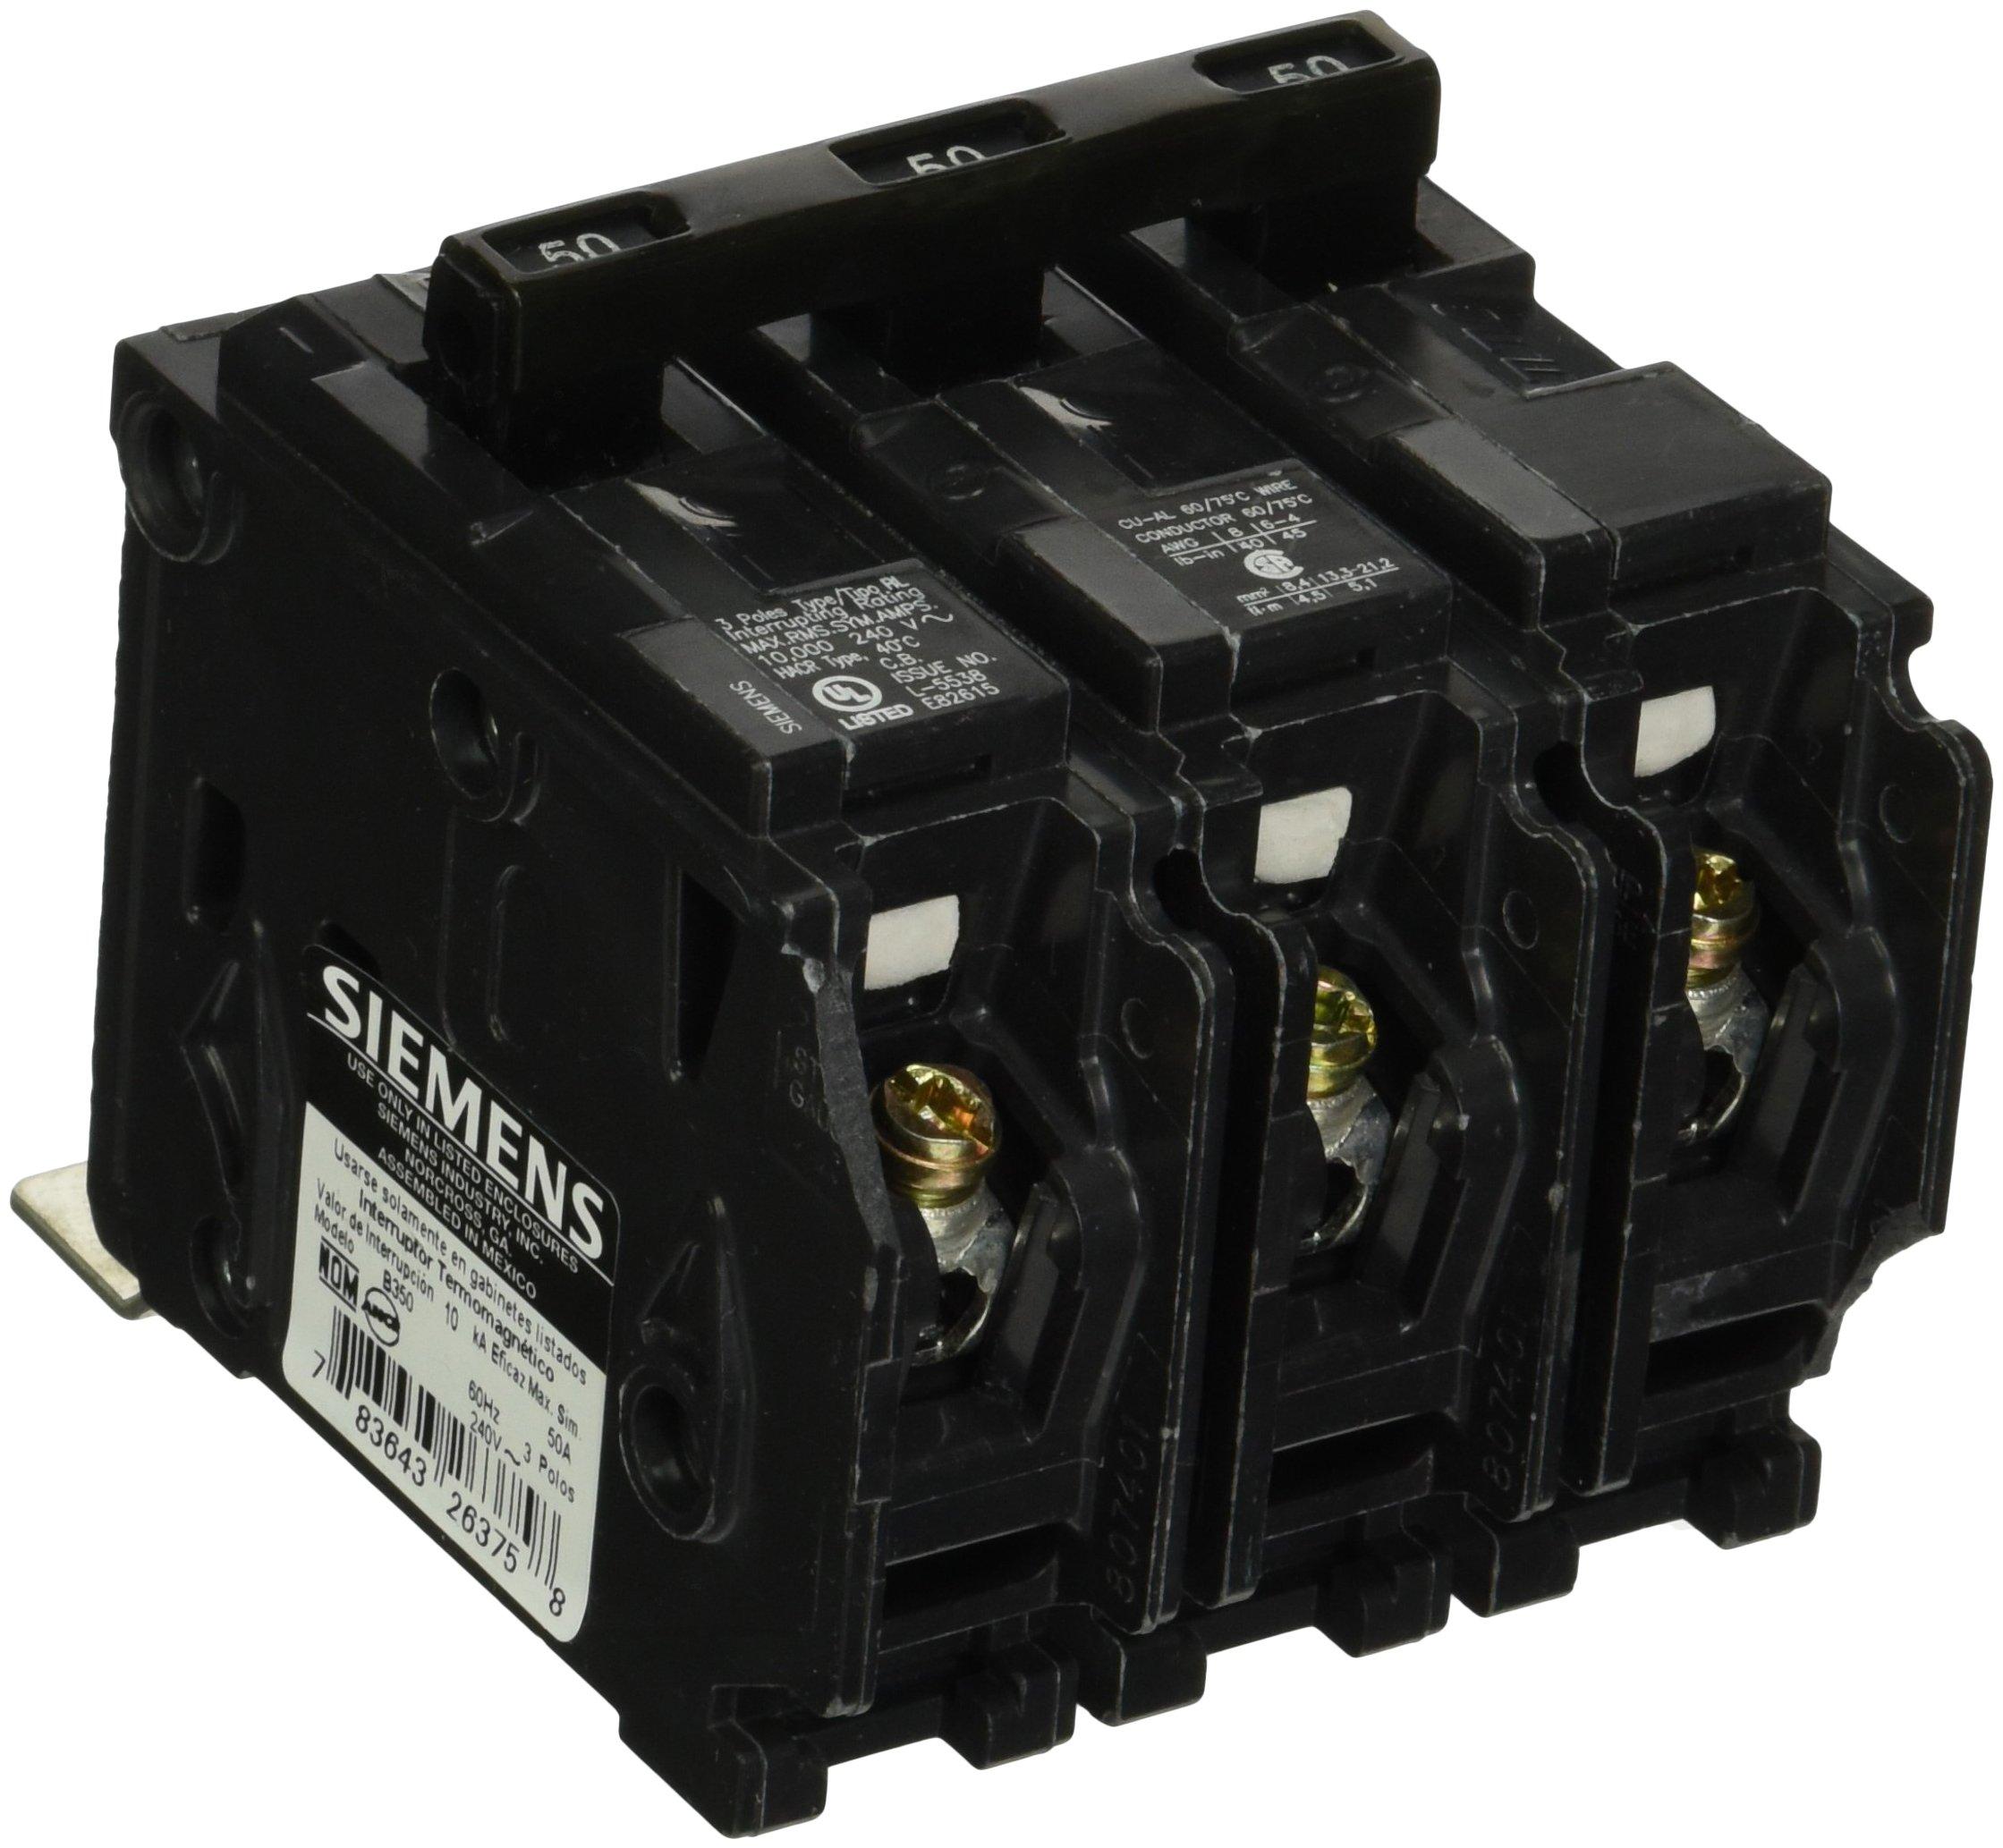 Siemens B350 50-Amp Three Pole 240-Volt 10KAIC Bolt in Breaker by SIEMENS